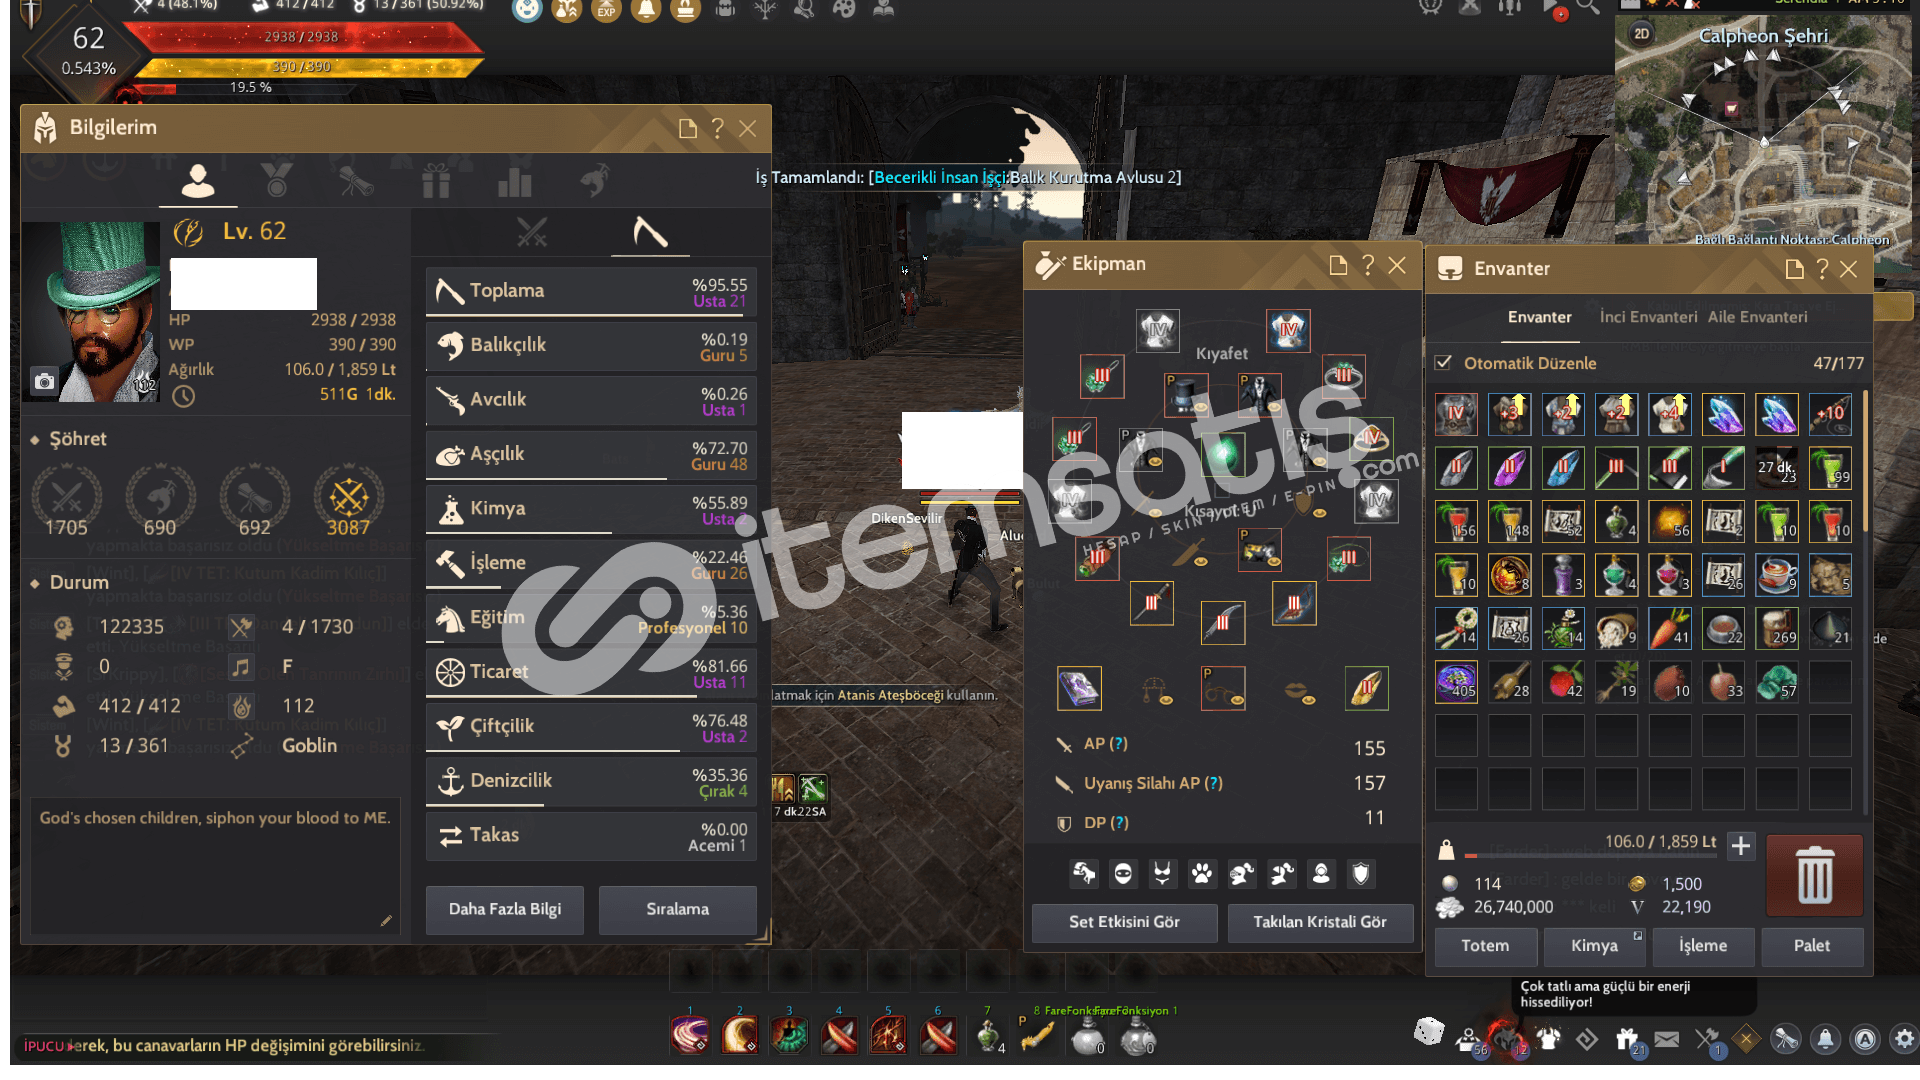 660 GS Sorc + LIFESKILL